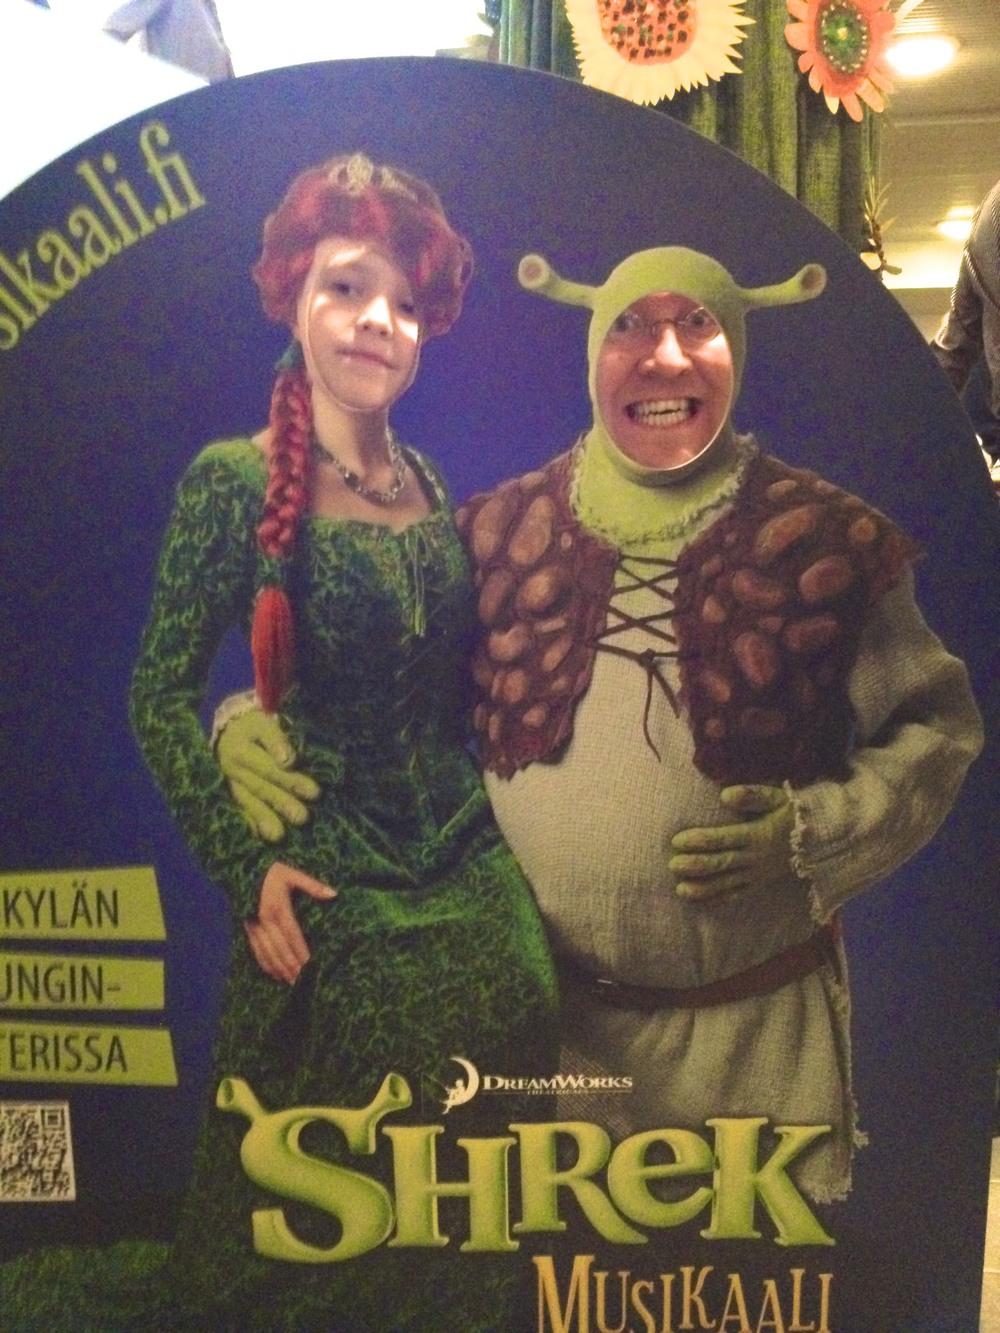 Kuvassa prinsessa Fionana Sinna (9v). ja Shrek-jättinä asukasyhdistyksen pj Erkka (31v).